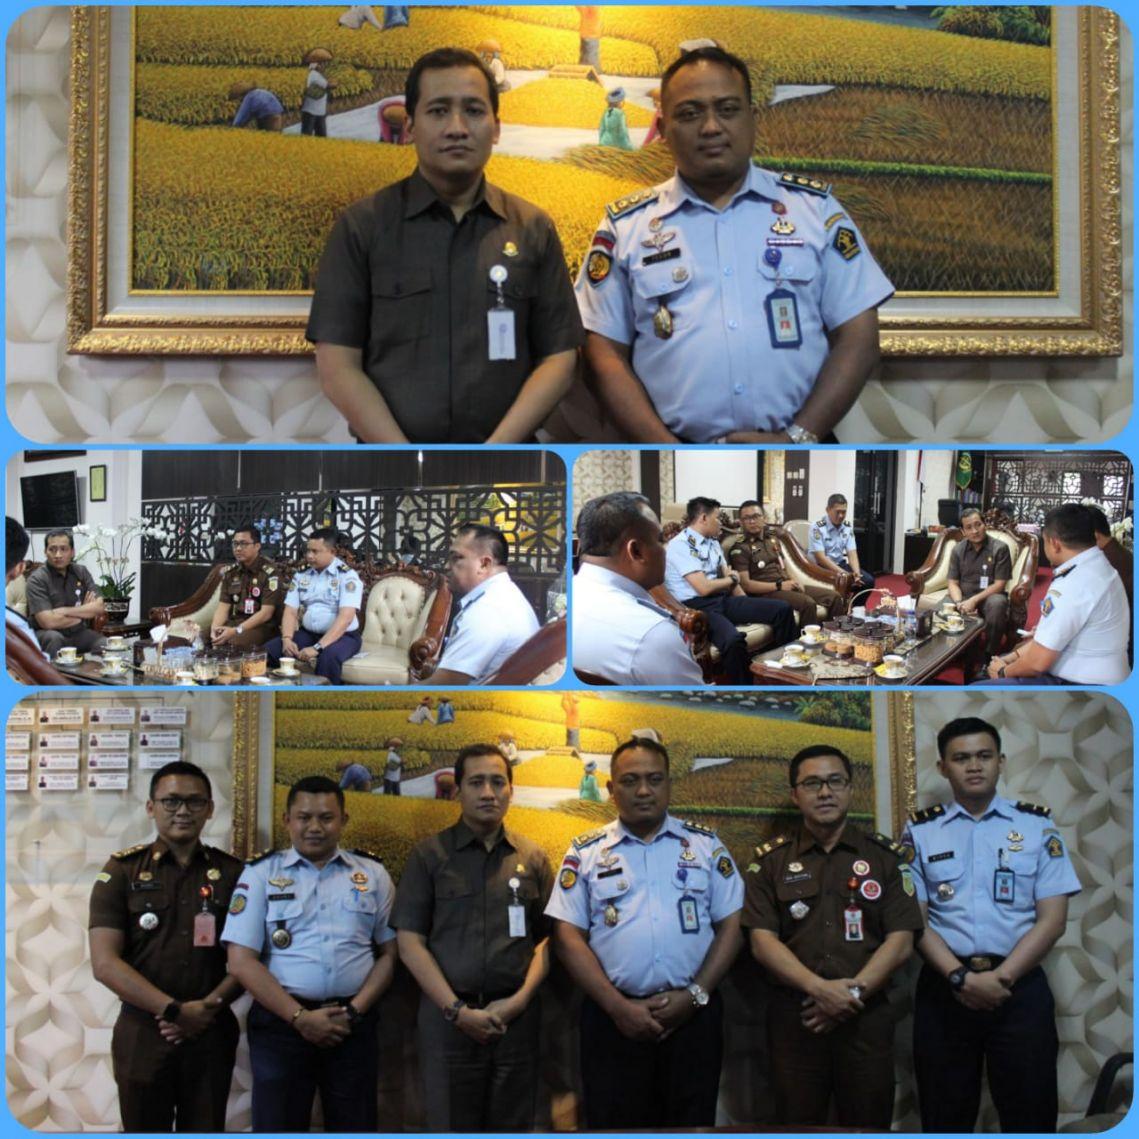 Silaturahmi Karutan Medaeng Ke Kantor Kejaksaan Negeri Surabaya 17-09-2018